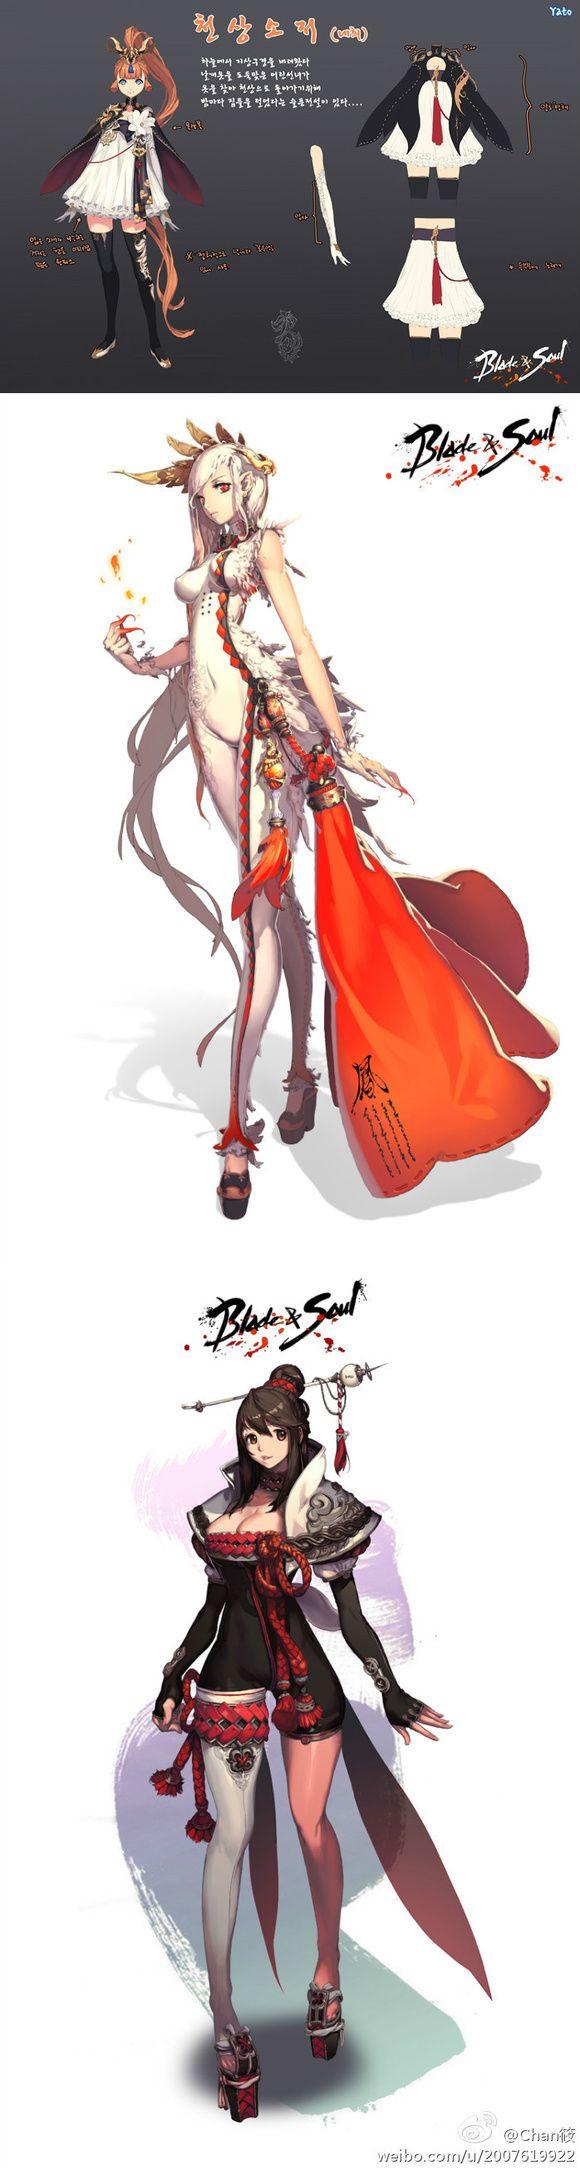 Master Anime Ecchi Picture Wallpapers (http://epicwallcz.blogspot.com/) Arms…